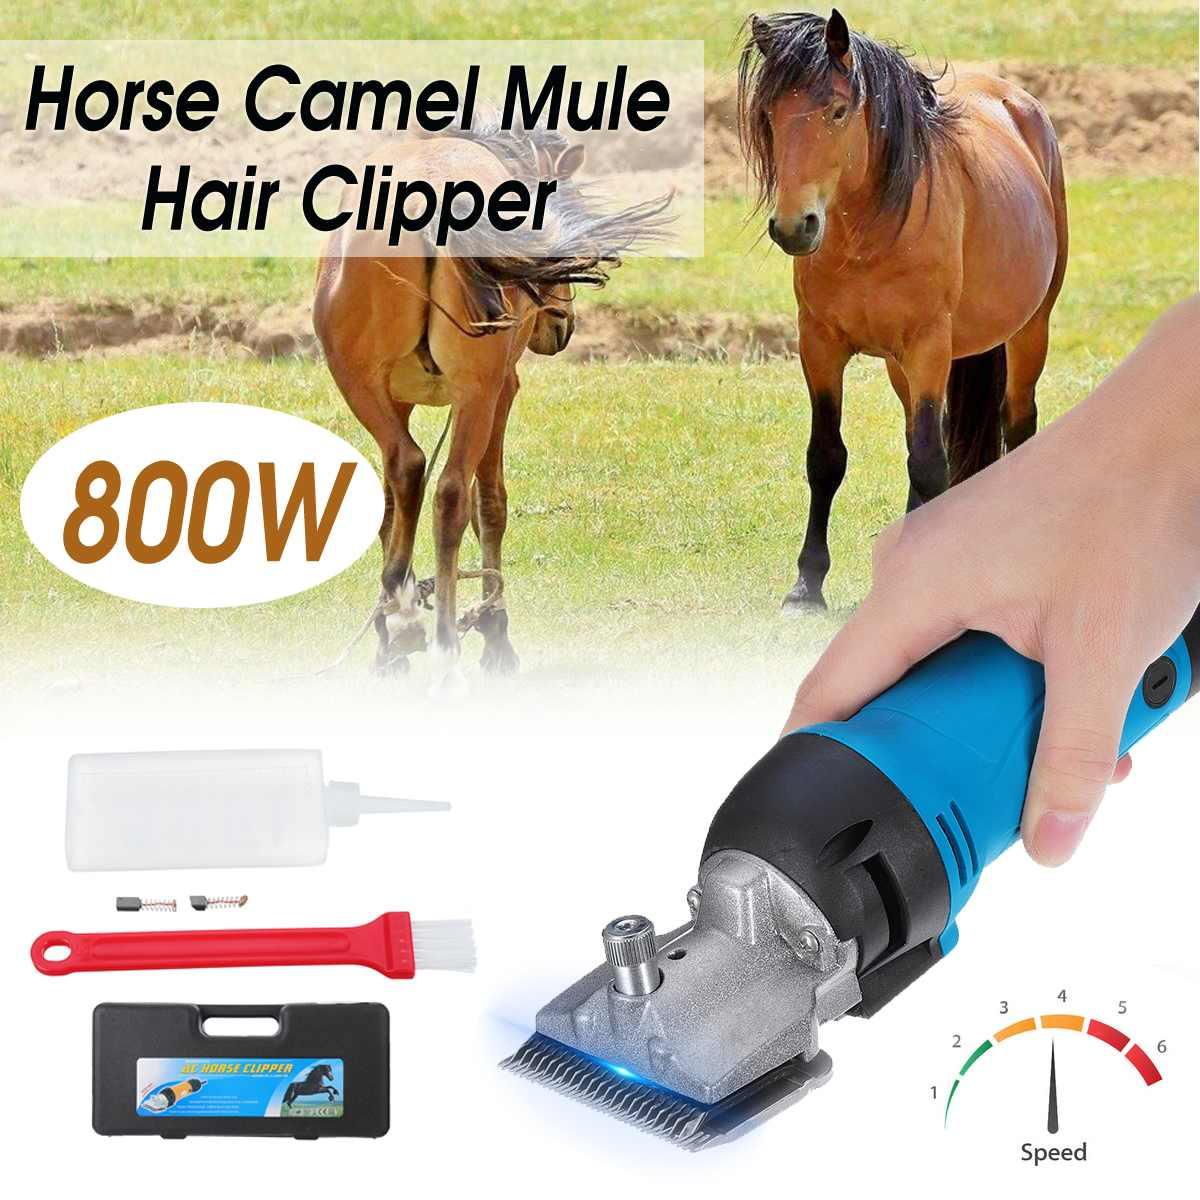 800W 6 Speed Electric Horse Hair Clipper Farm Animal Shearing Trimmer Shaver Cut Machine for Camel Cow Horse Goat AU Plug w/Box|Scissors| |  - title=